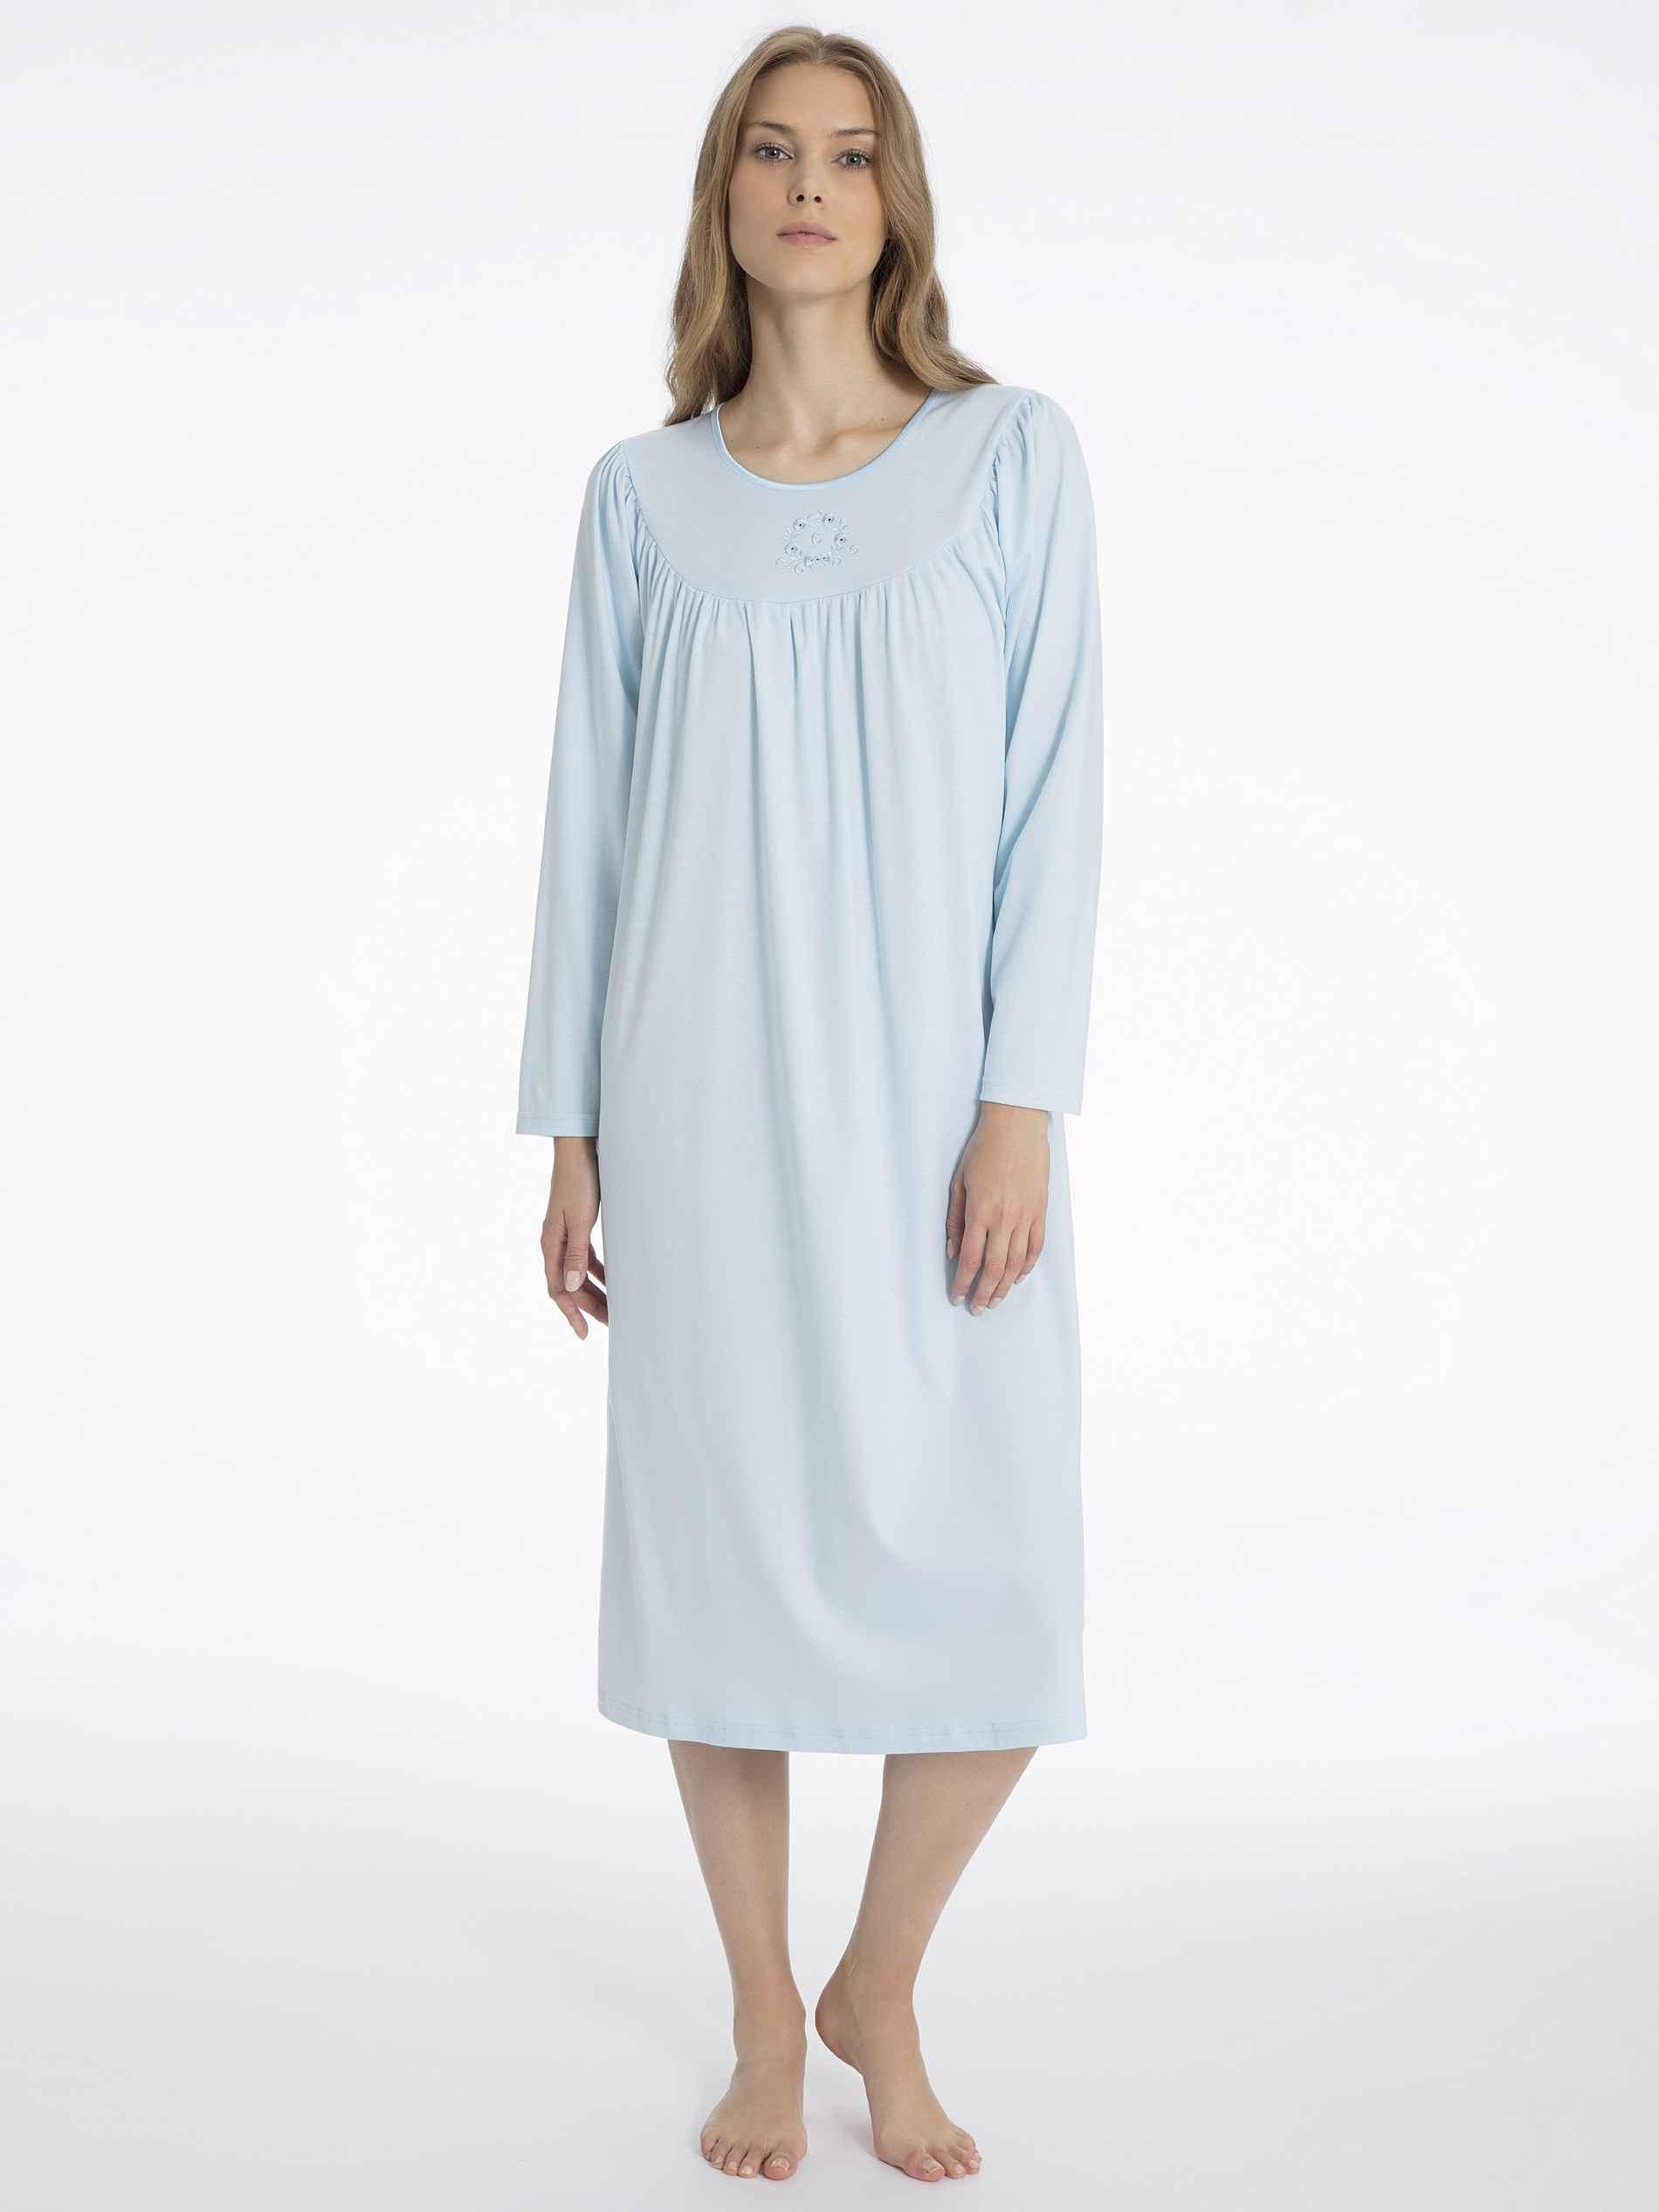 Damen CALIDA Soft Cotton Nightshirt langarm blau | 07610441086742